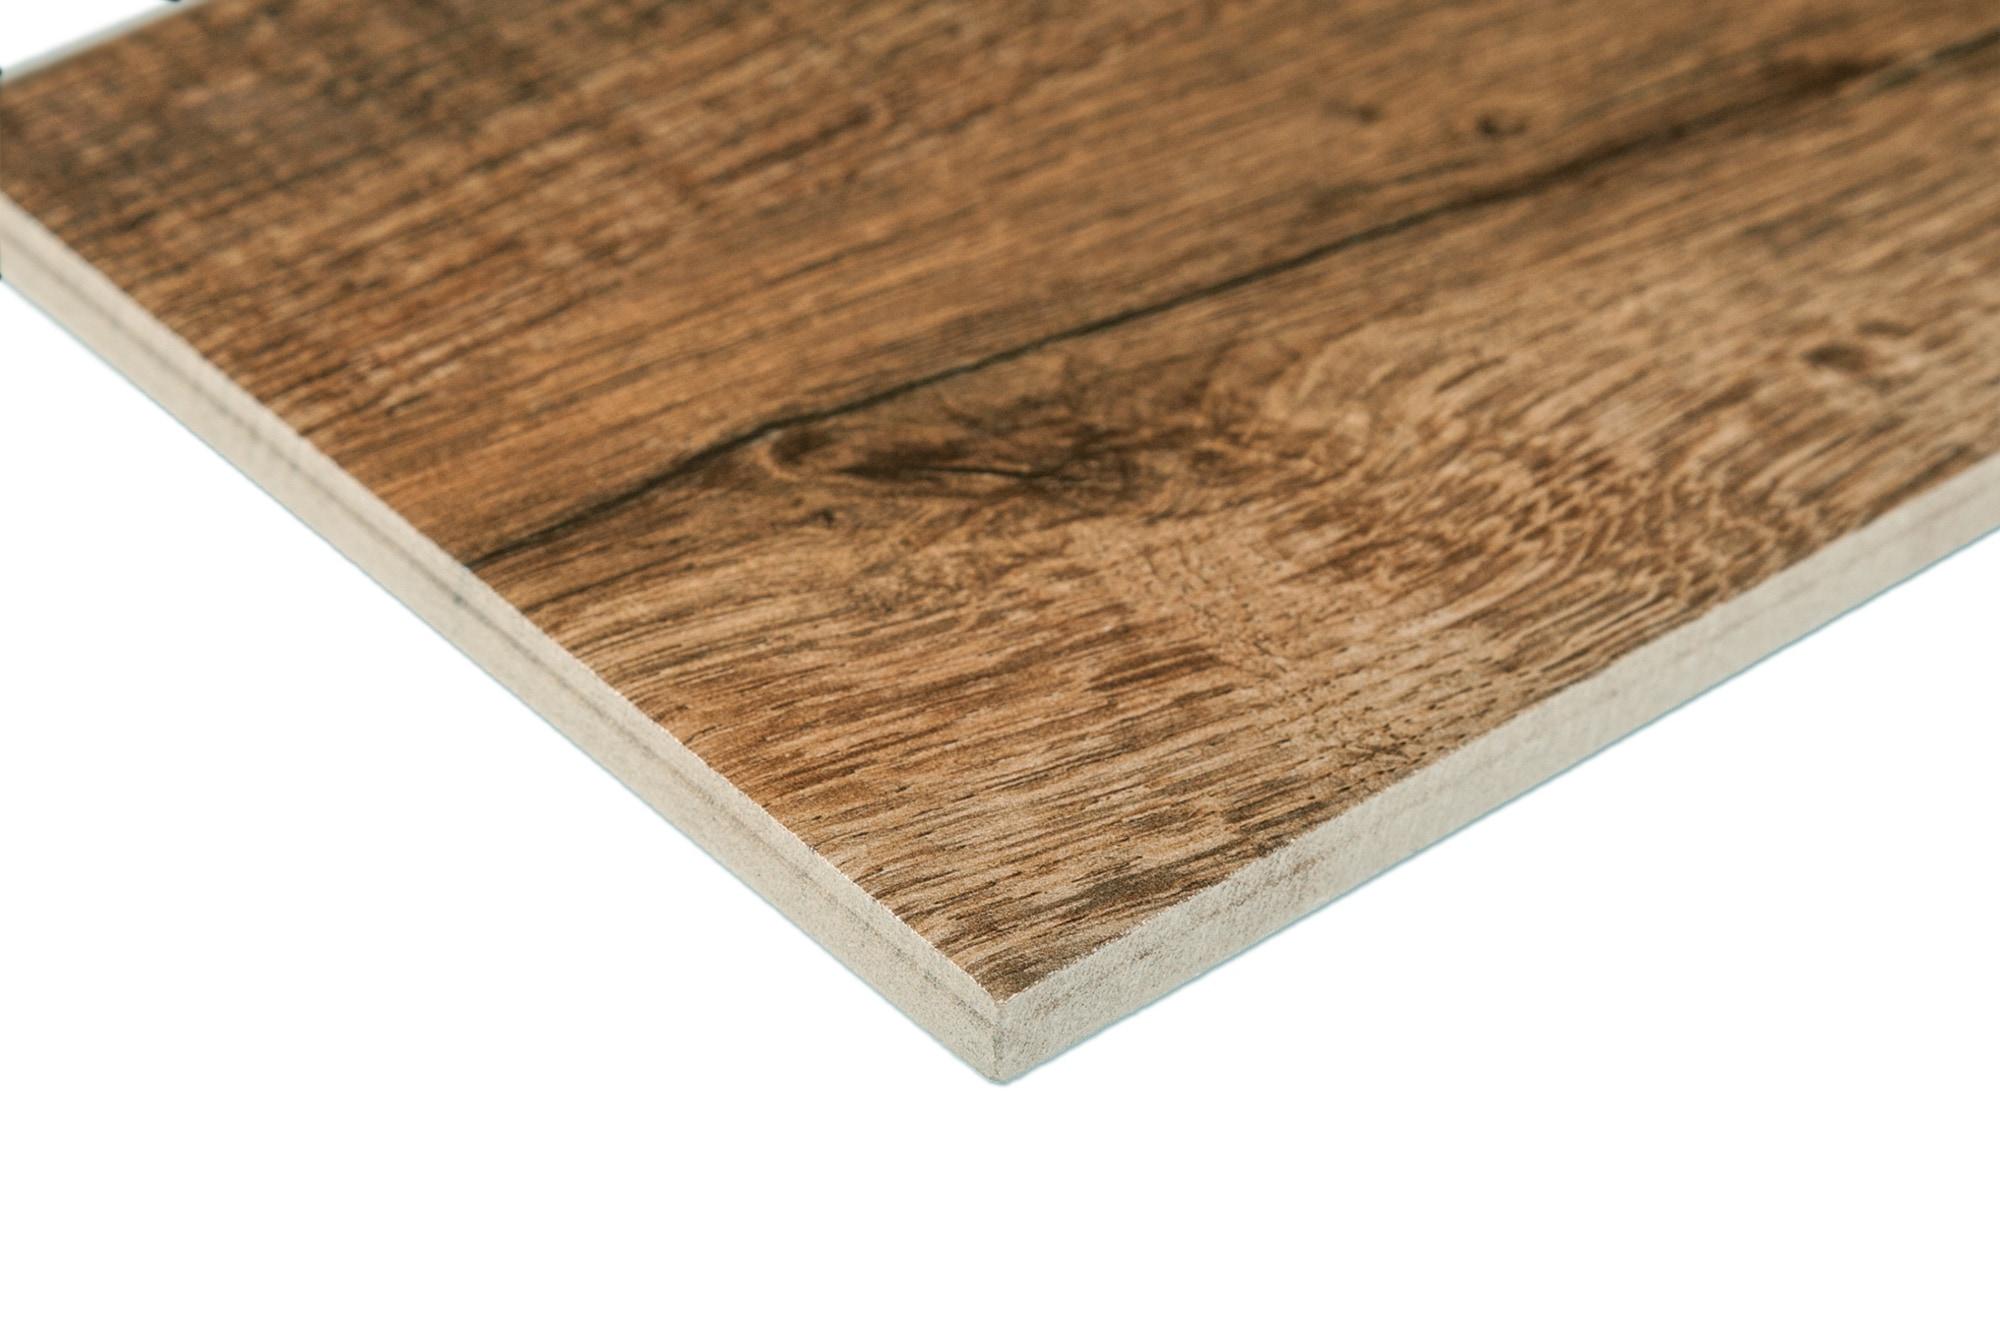 Free samples salerno ceramic tile barcelona wood series heritage free samples salerno ceramic tile barcelona wood series heritage wood 6x24 dailygadgetfo Gallery